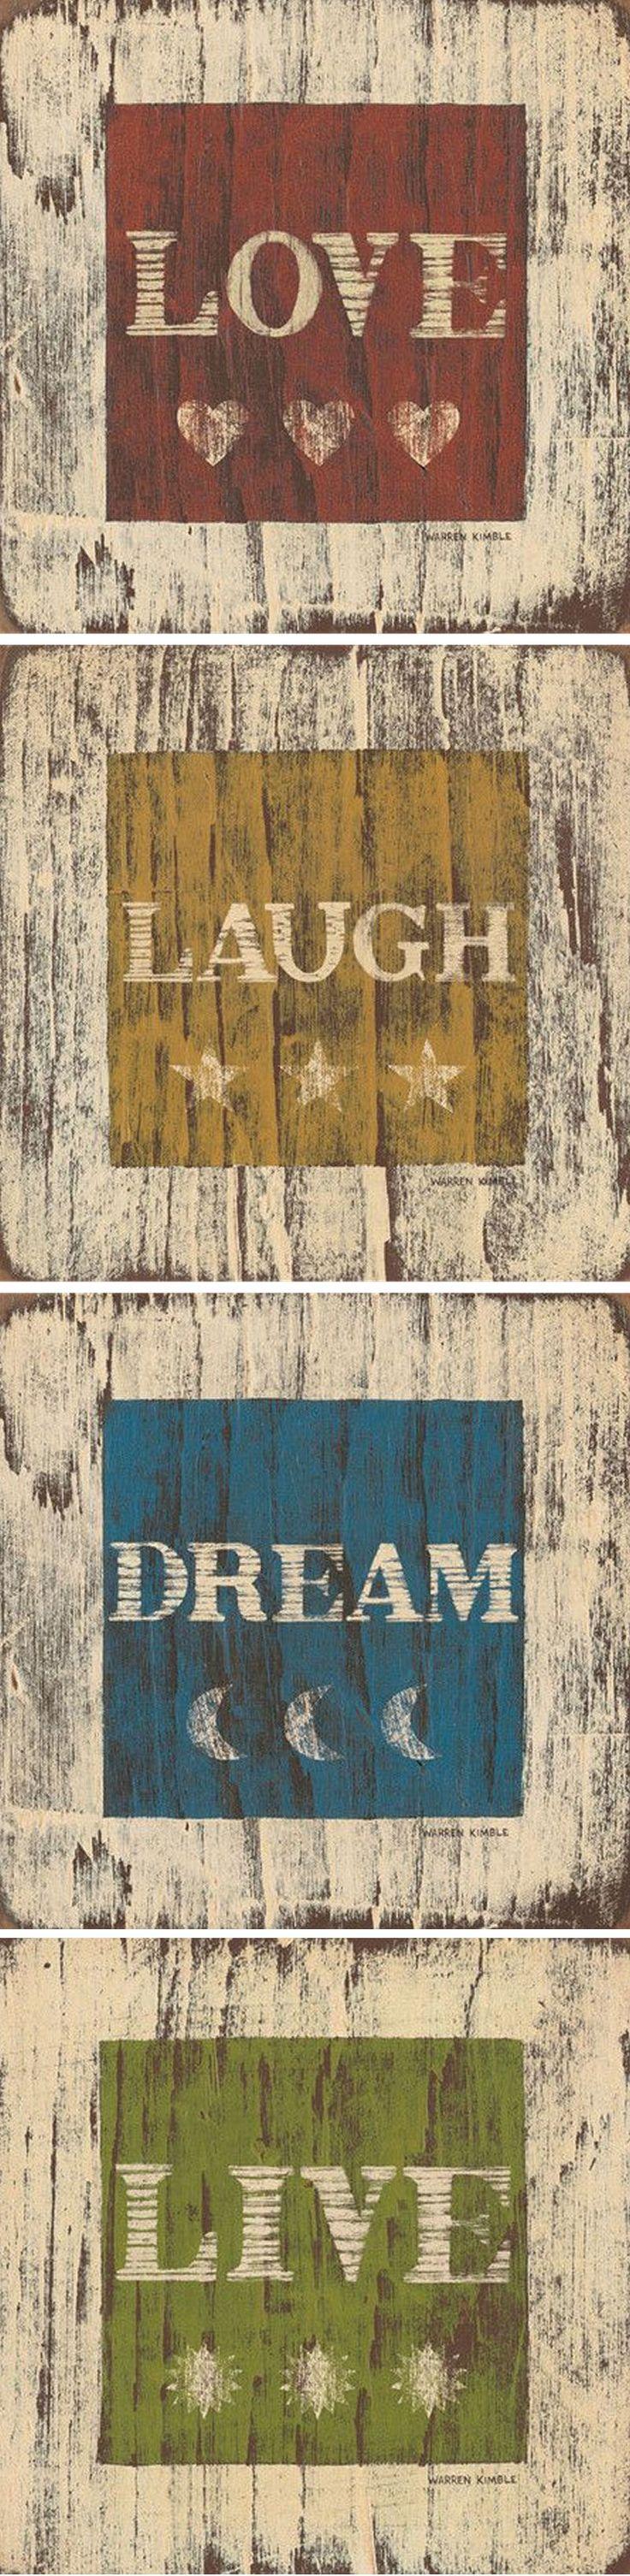 Love * Laugh * Dream * Live Inspirational Wall Art <3